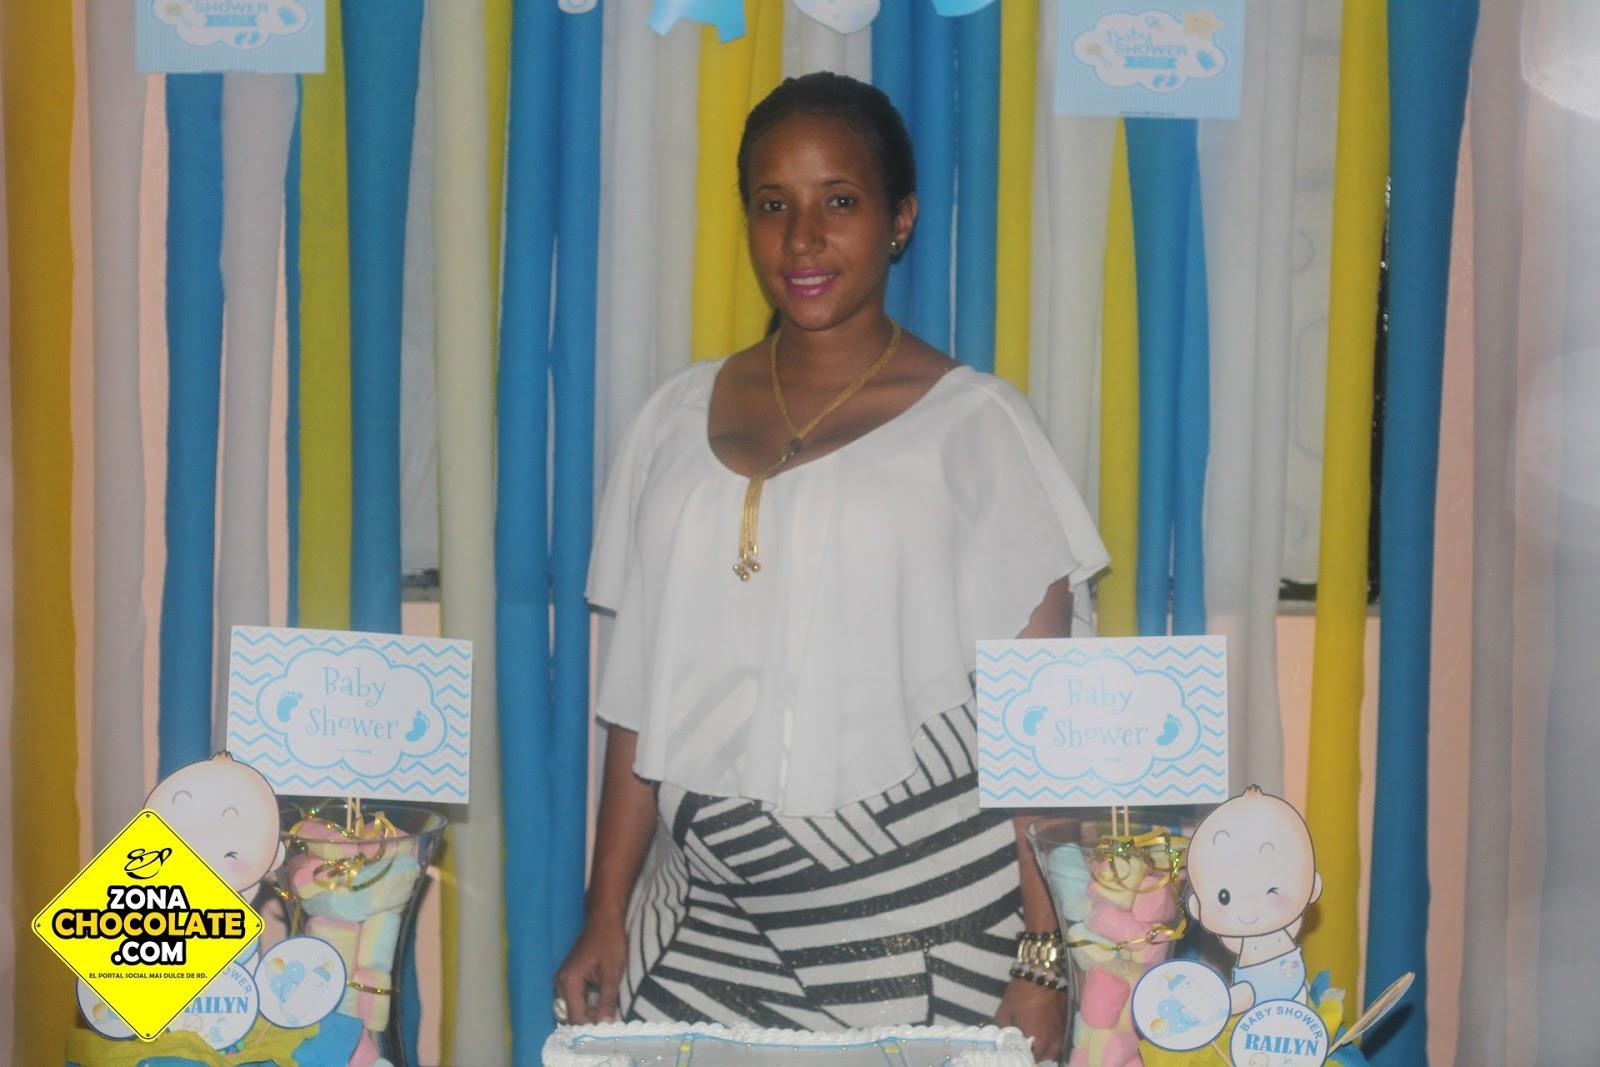 420c329e9 FOTOS - Celebran BabyShower de Evelyn Vanessa Dominguez en Nagua